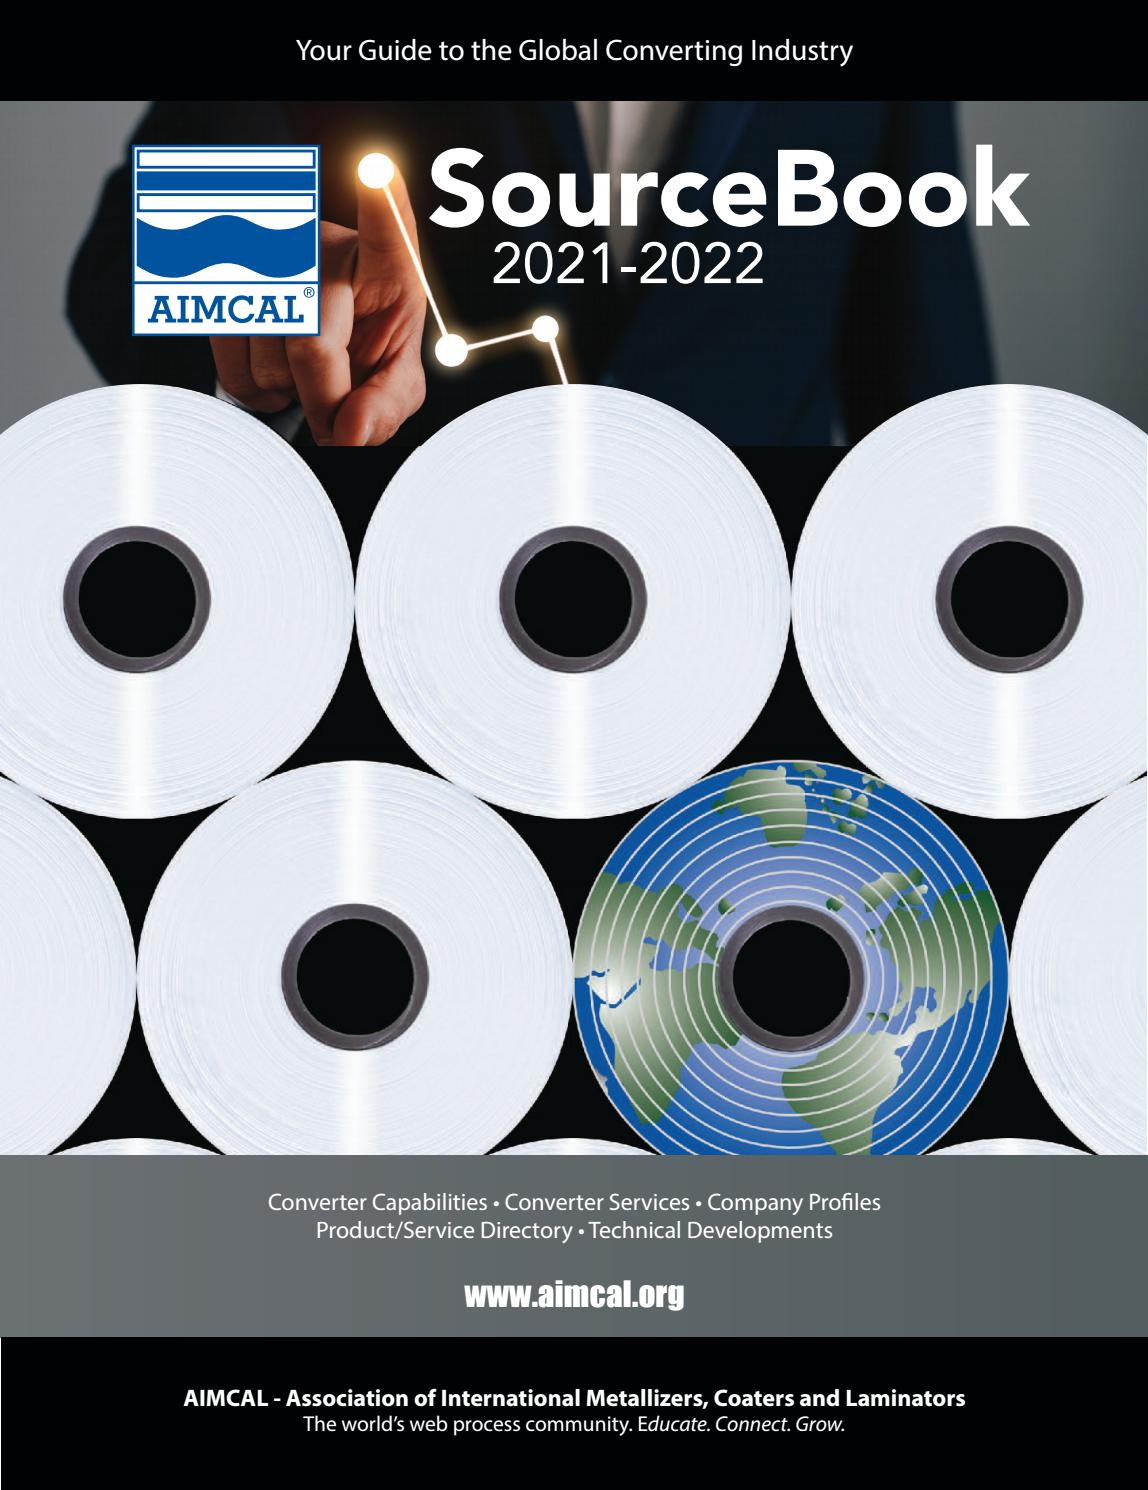 Uml Calendar Spring 2022.Aimcal Sourcebook 2021 2022 By Petersonpublications Issuu